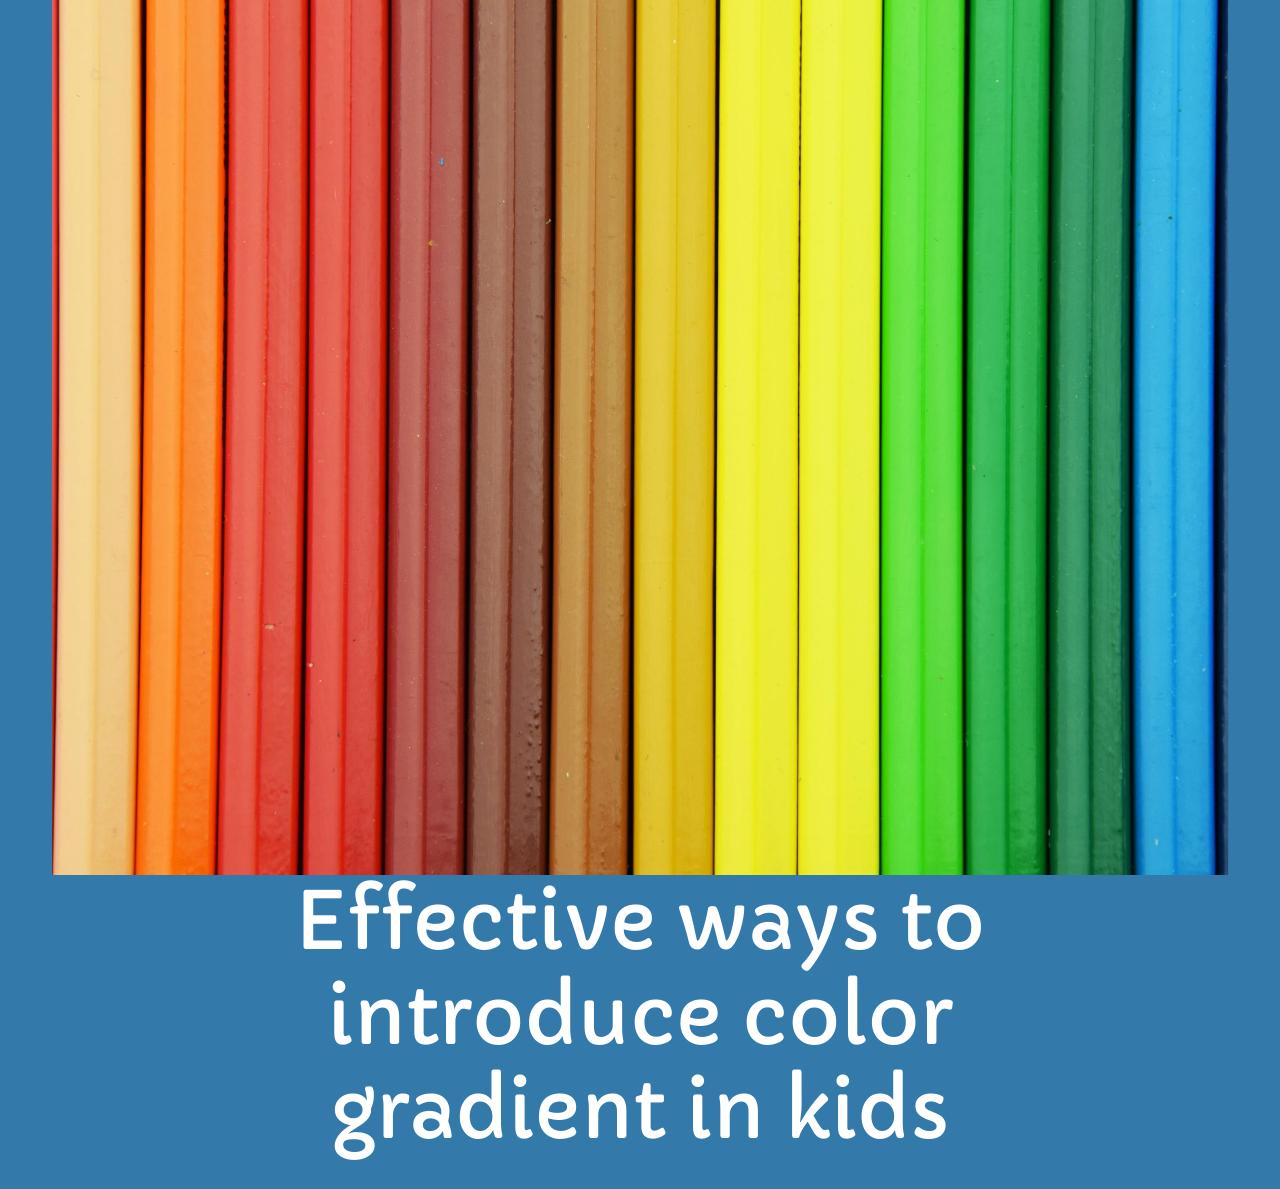 Color gradient for children